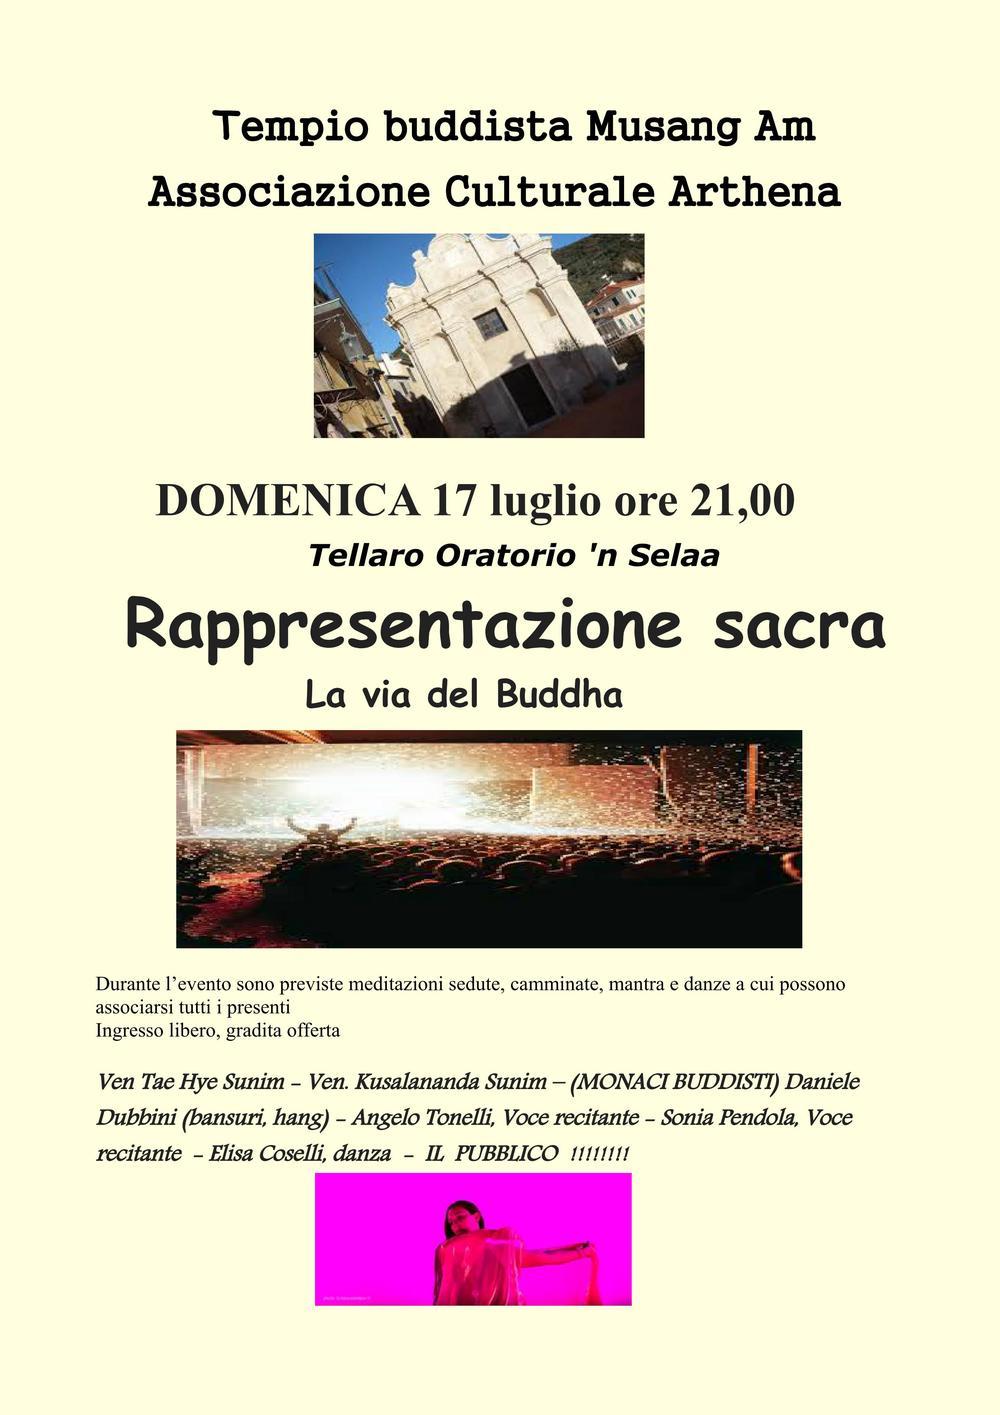 17-7-16 VOLANTINO DEFDEF_01.jpg